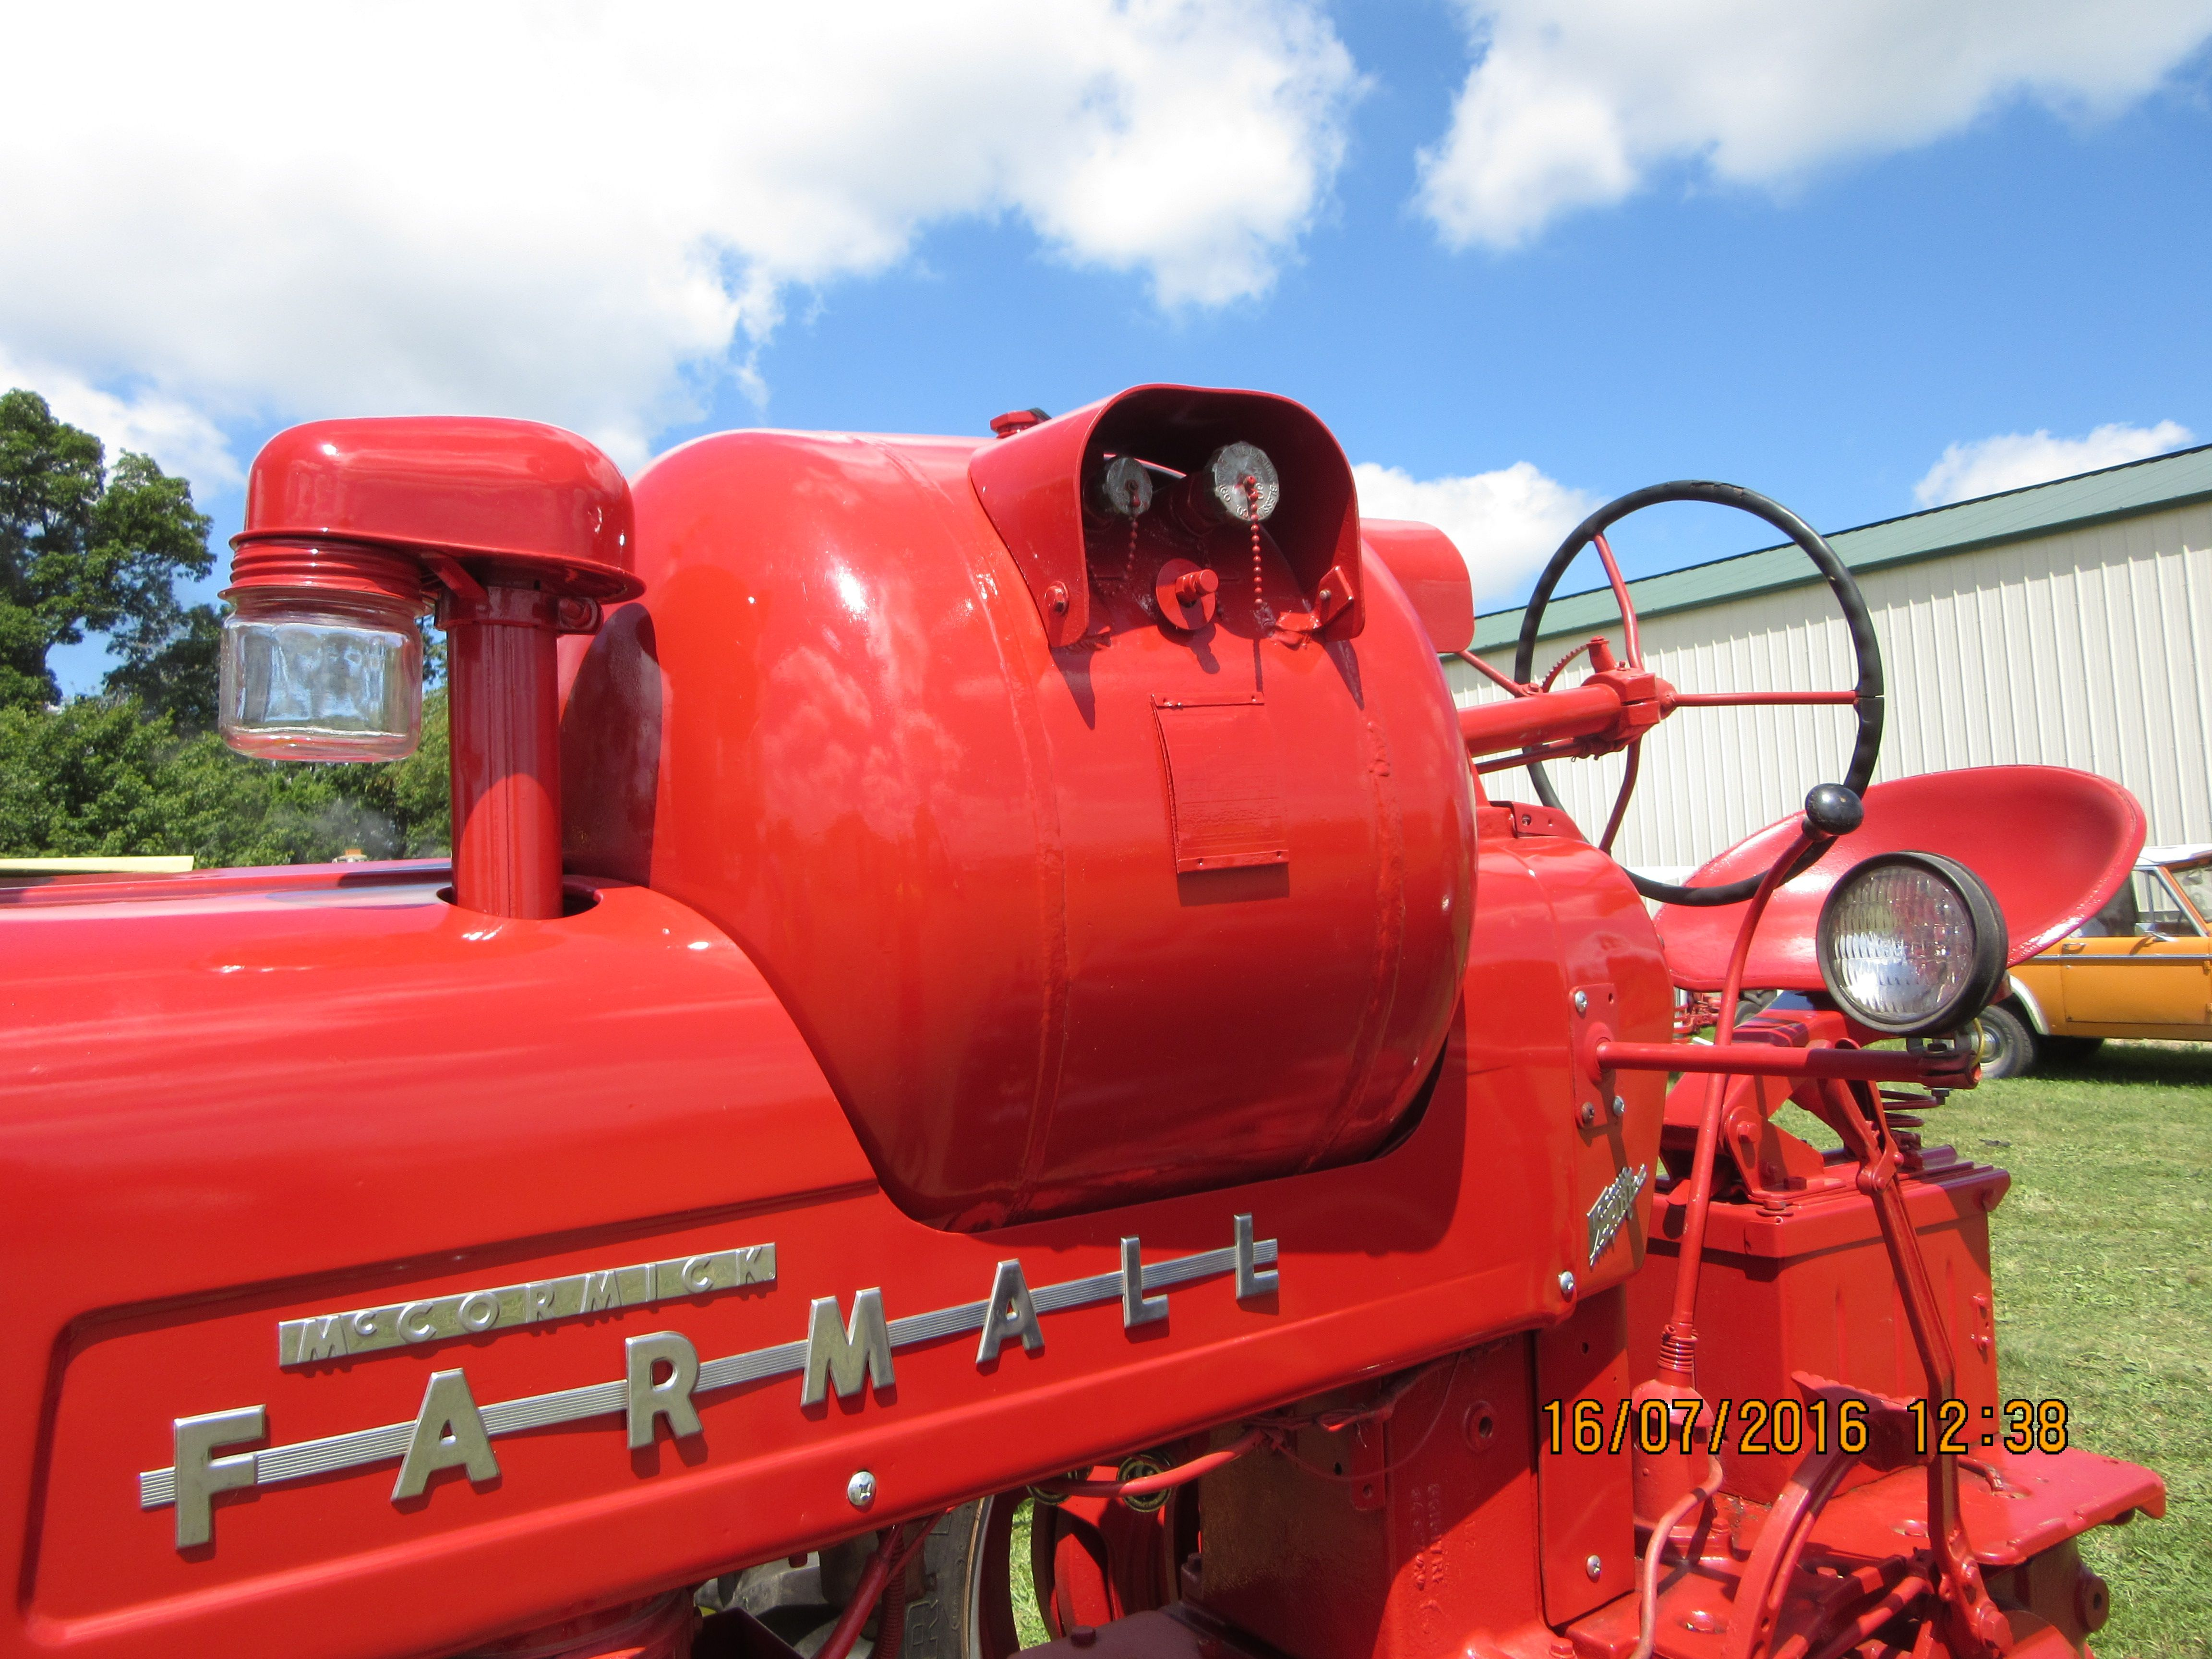 closeup of 1955 farmall 400 lpg red tractor tractors case ih international harvester [ 4608 x 3456 Pixel ]